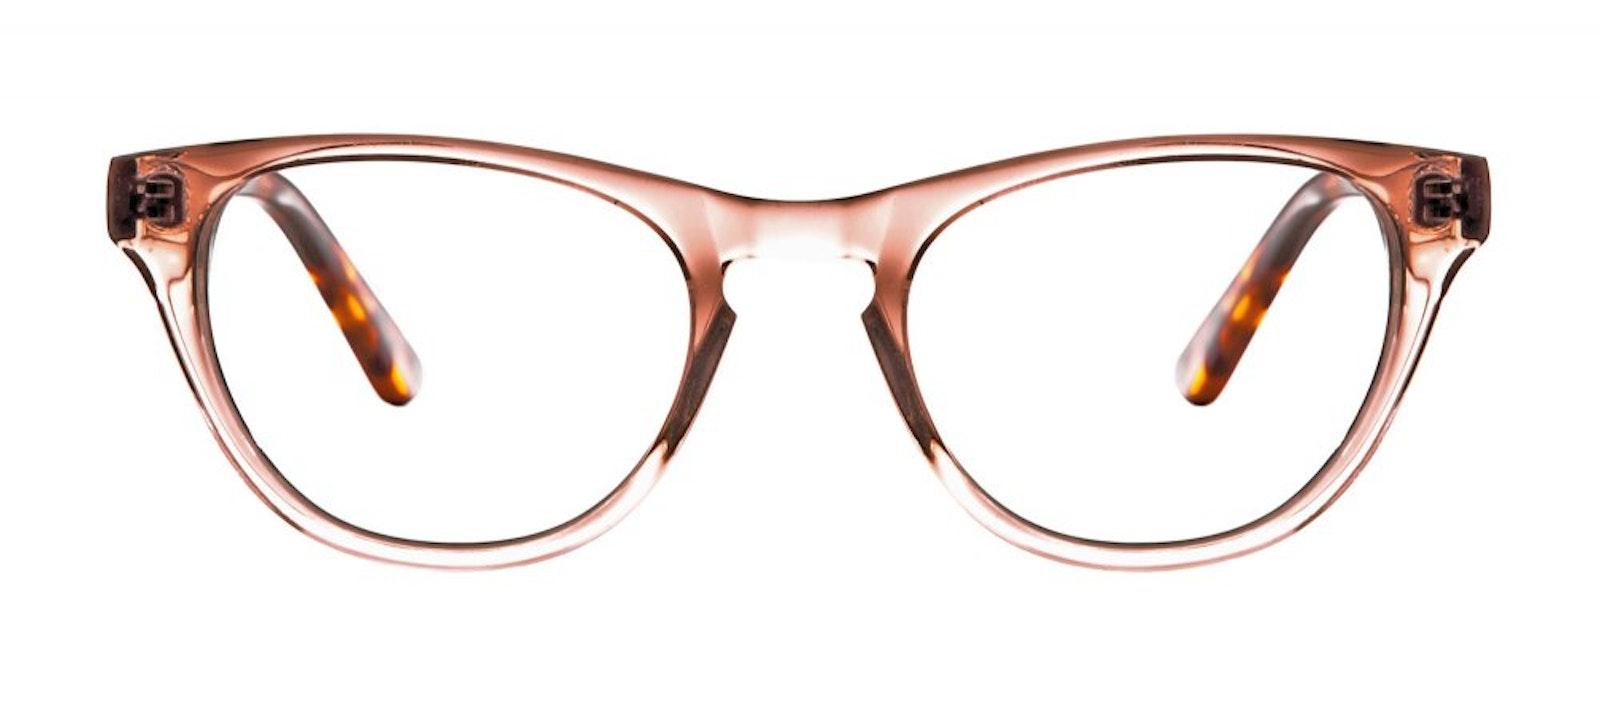 51e83027c800 Affordable Fashion Glasses Cat Eye Eyeglasses Women Selfie Rose Sepia Front  ...